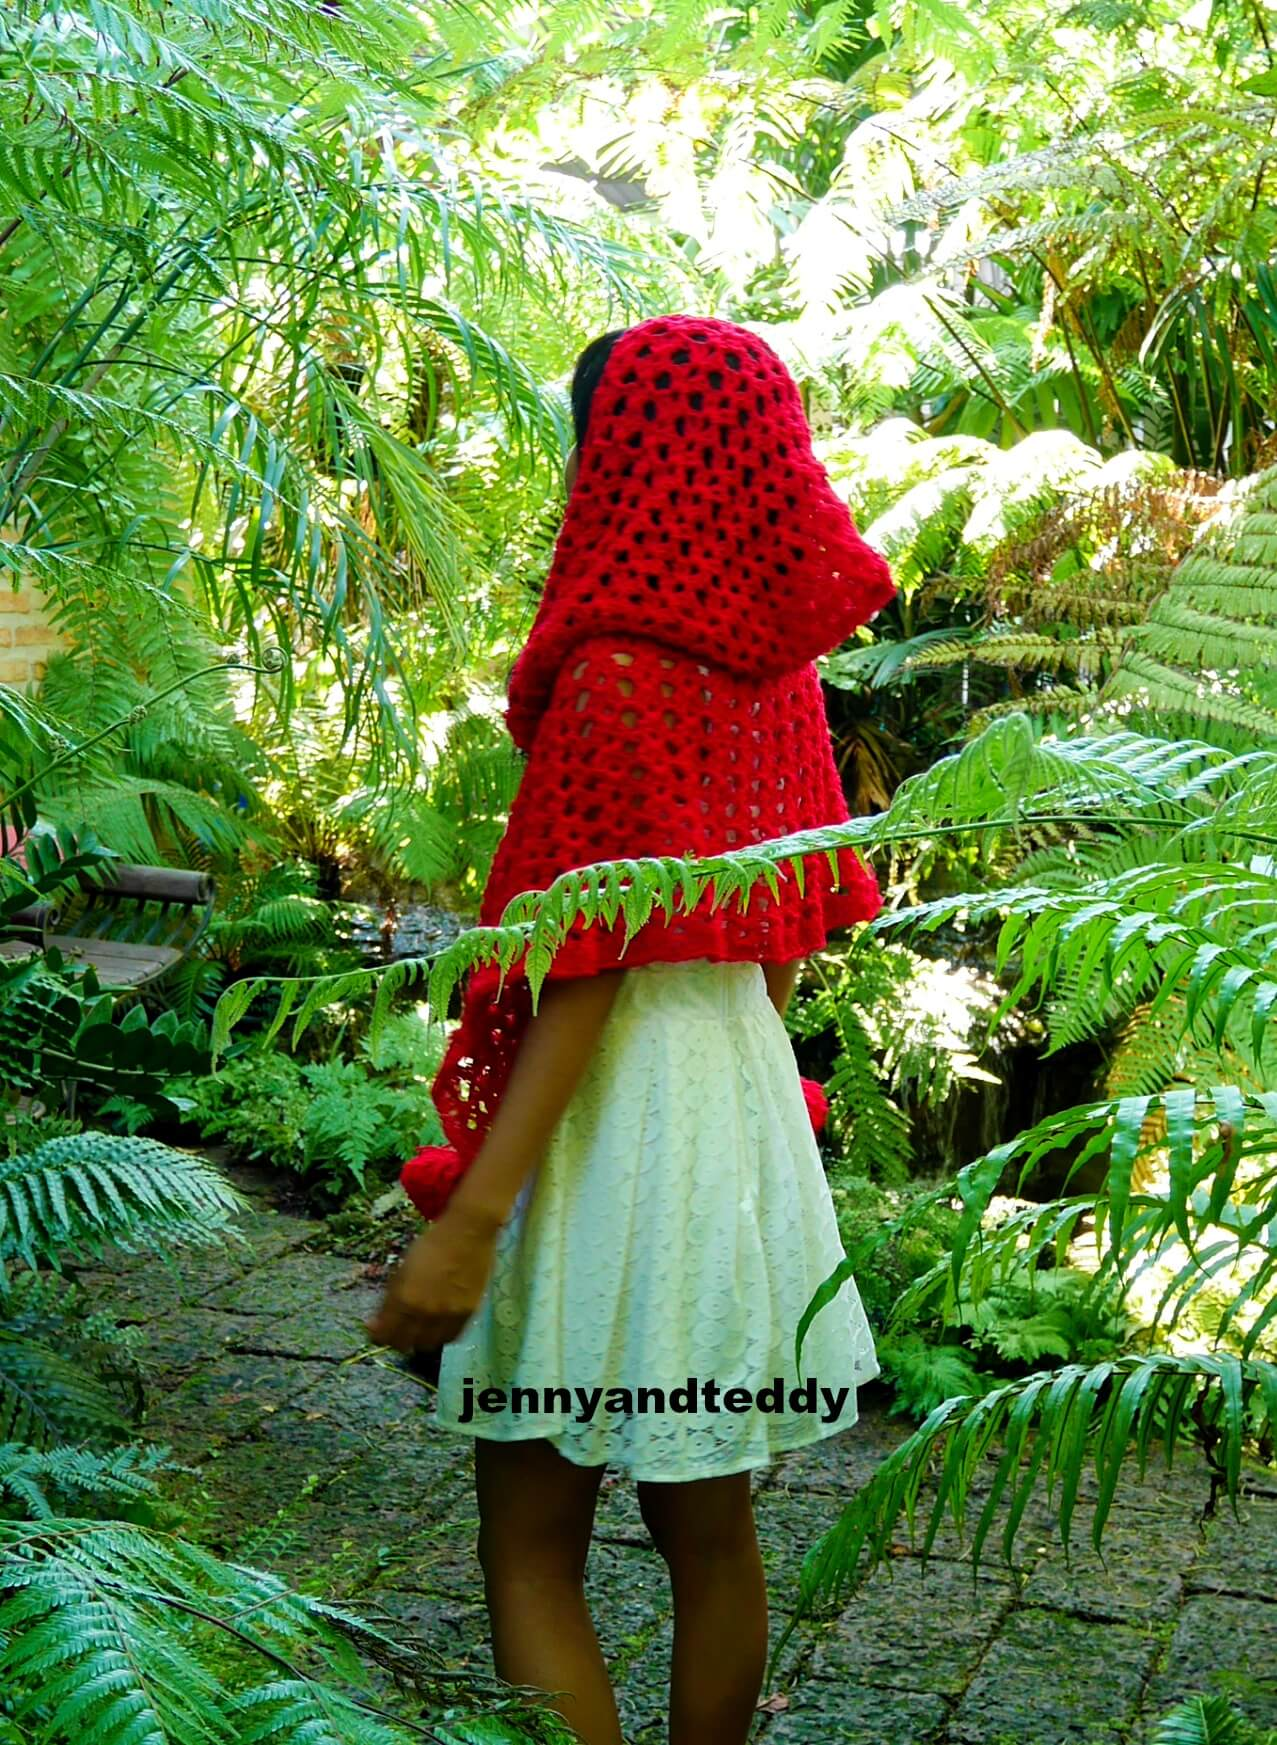 Amigurumi Lol Baby Doll Free Crochet Pattern – Free Crochet Pinto Live | 1745x1277